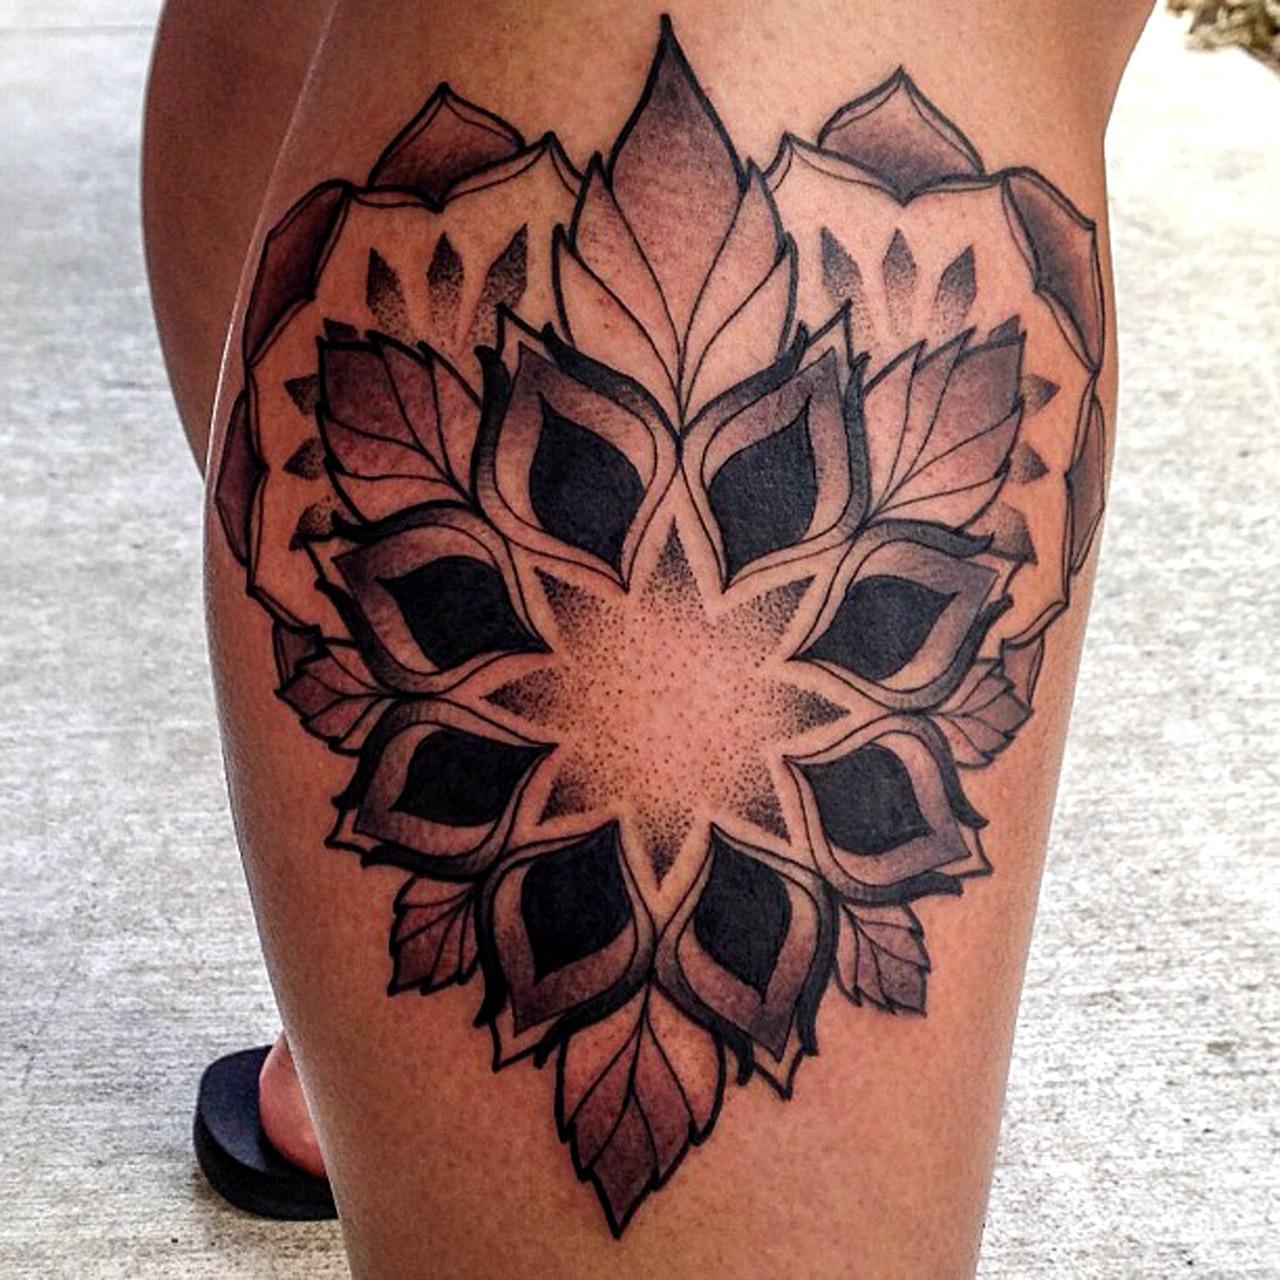 Tattoo done by Billy Weigler